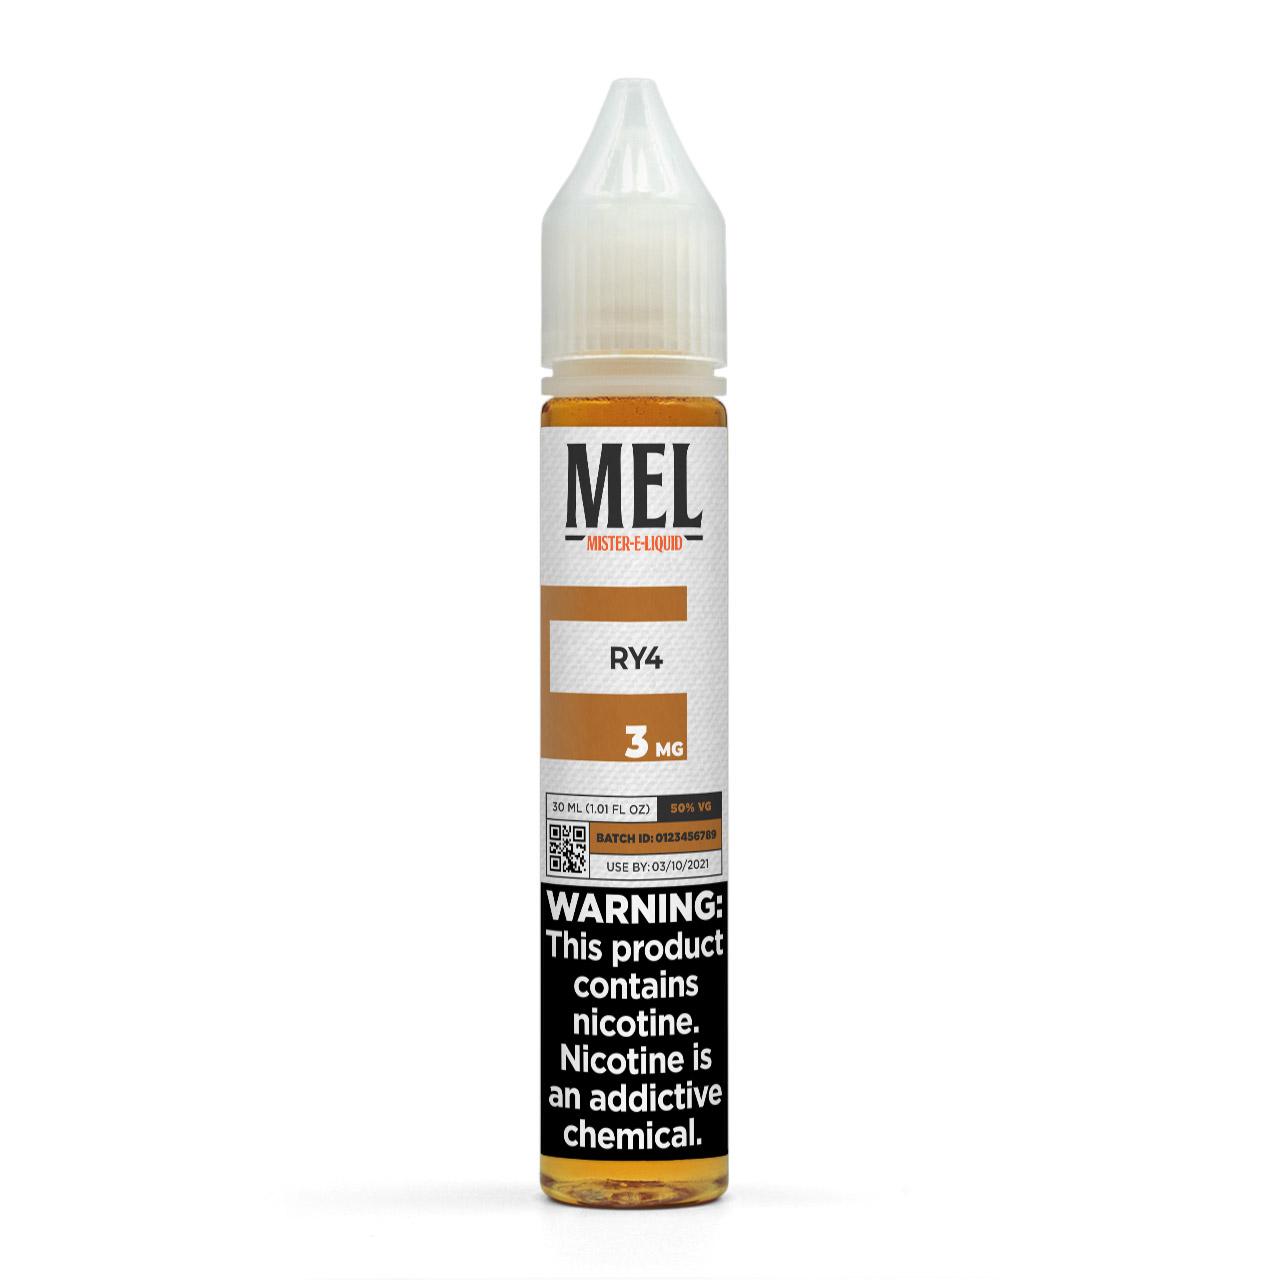 MEL RY4 Vape Juice, 3 mg